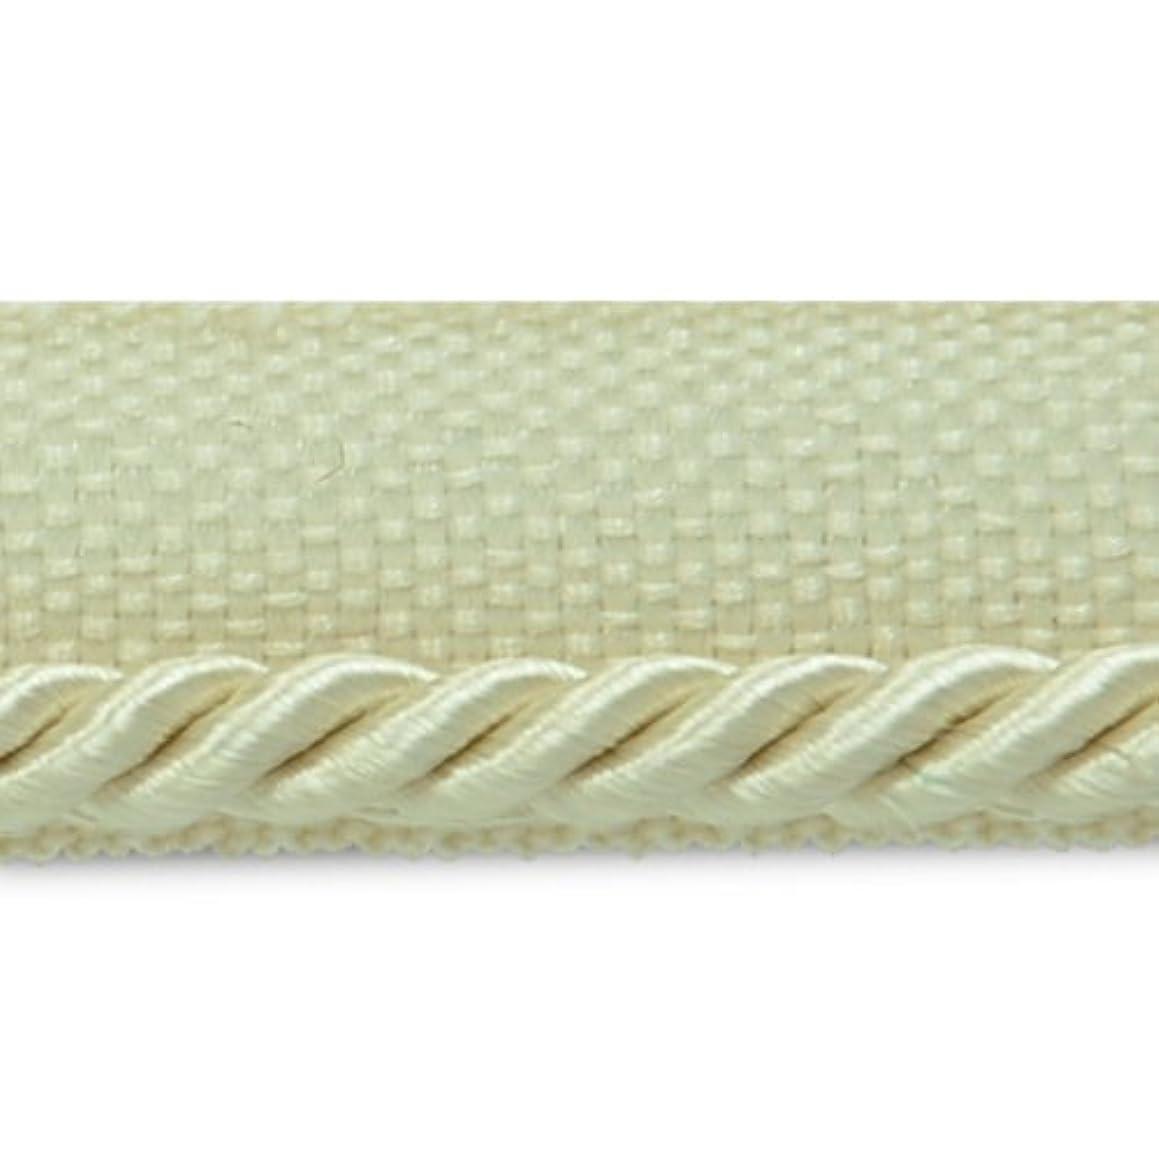 Expo International 20-Yard Ebony Twisted Lip Cord Trim Embellishment, 1/8-Inch, Ivory